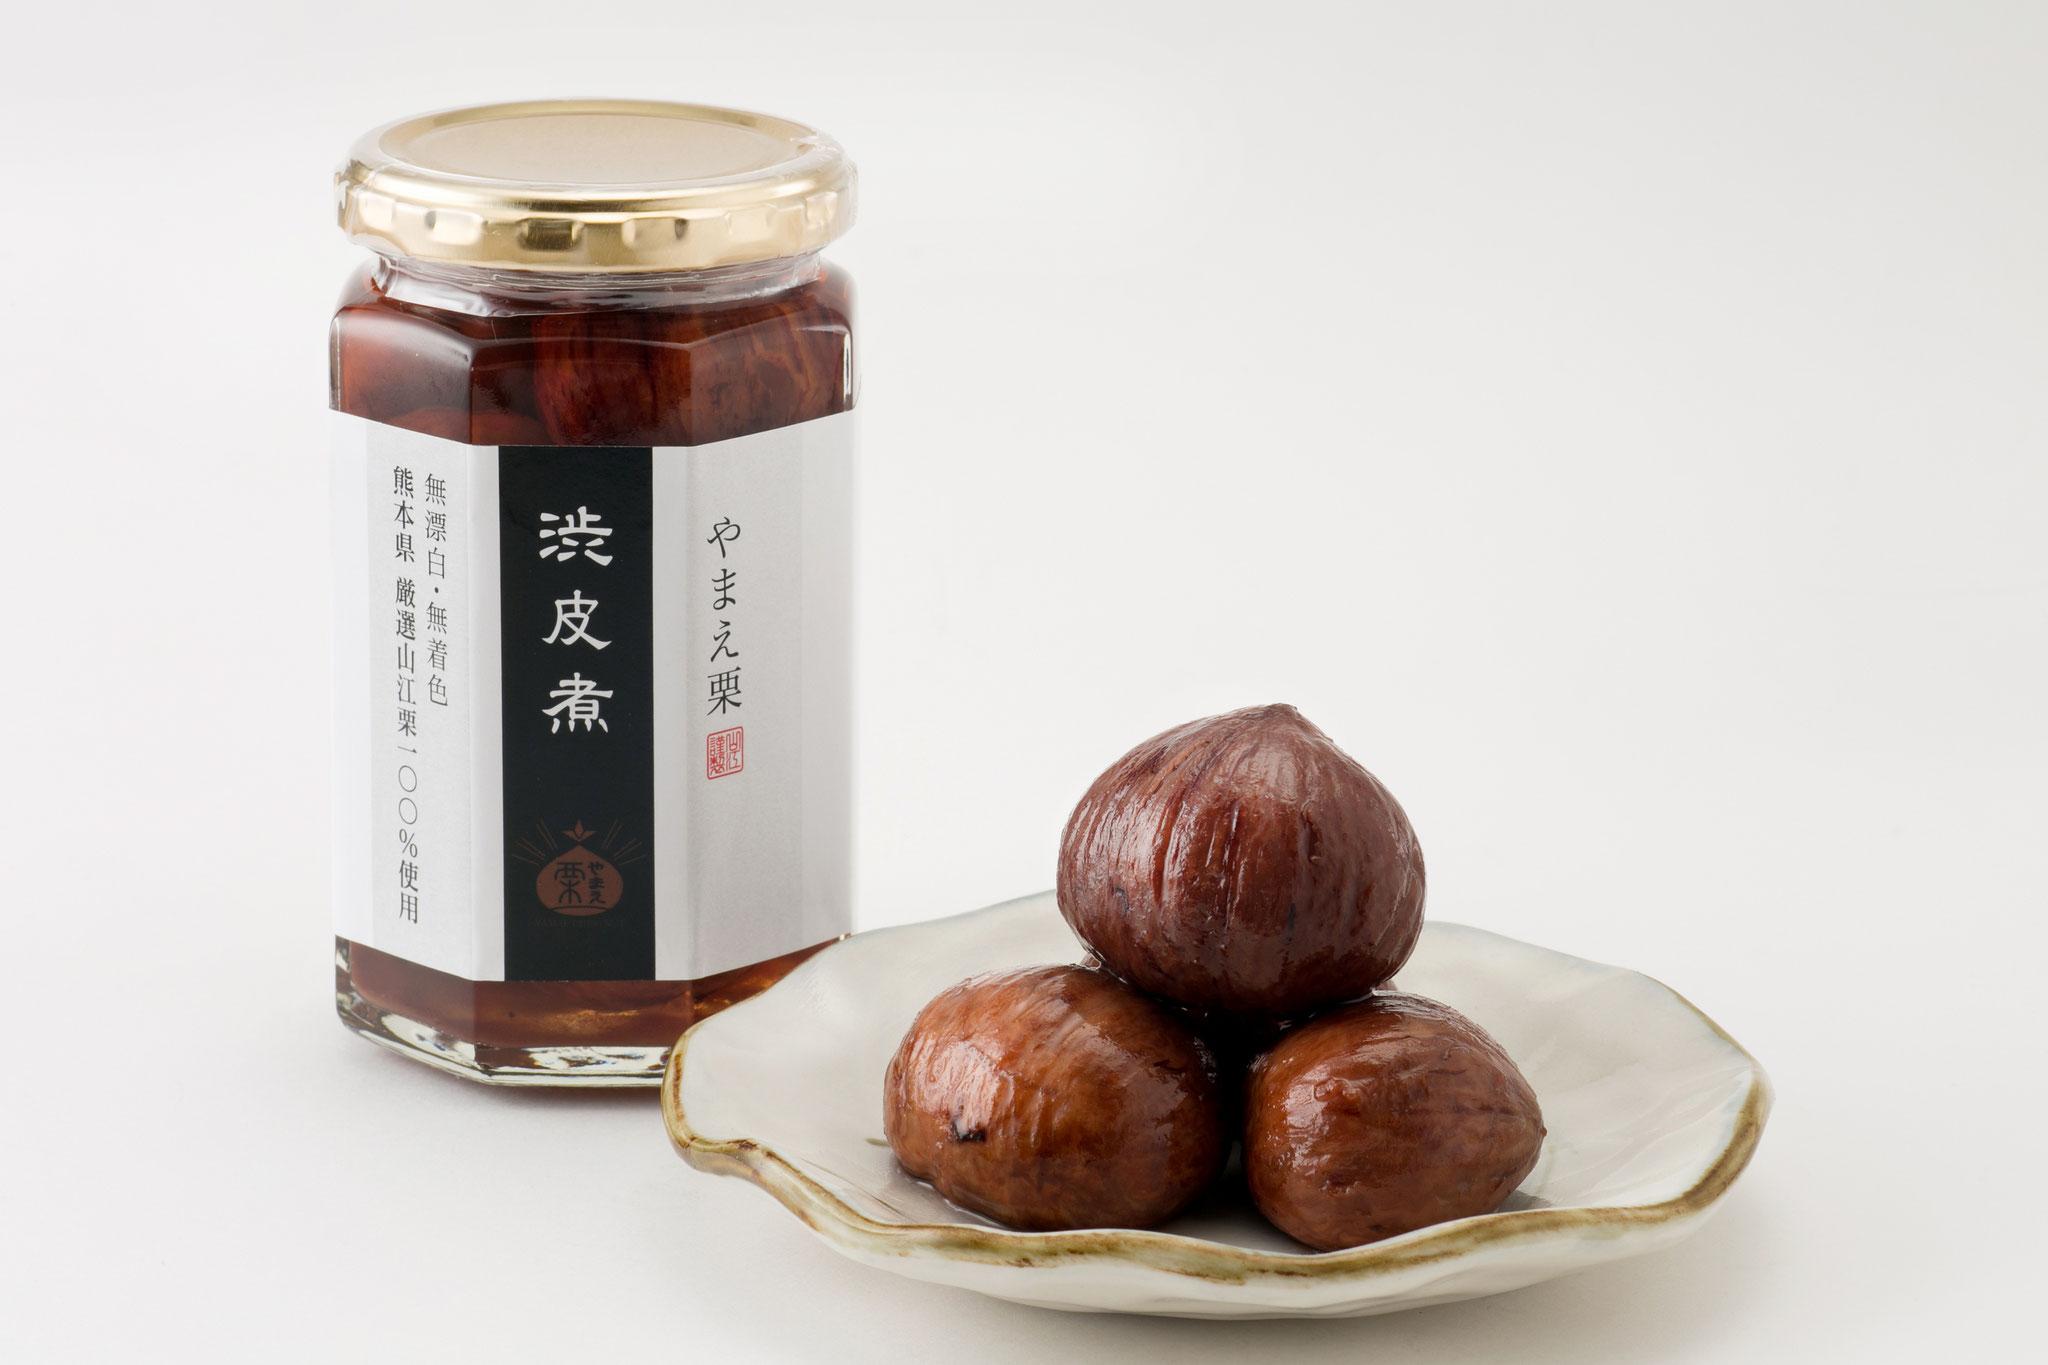 Shibukawa-ni Standard (marron cuit avec des peaux âpres)